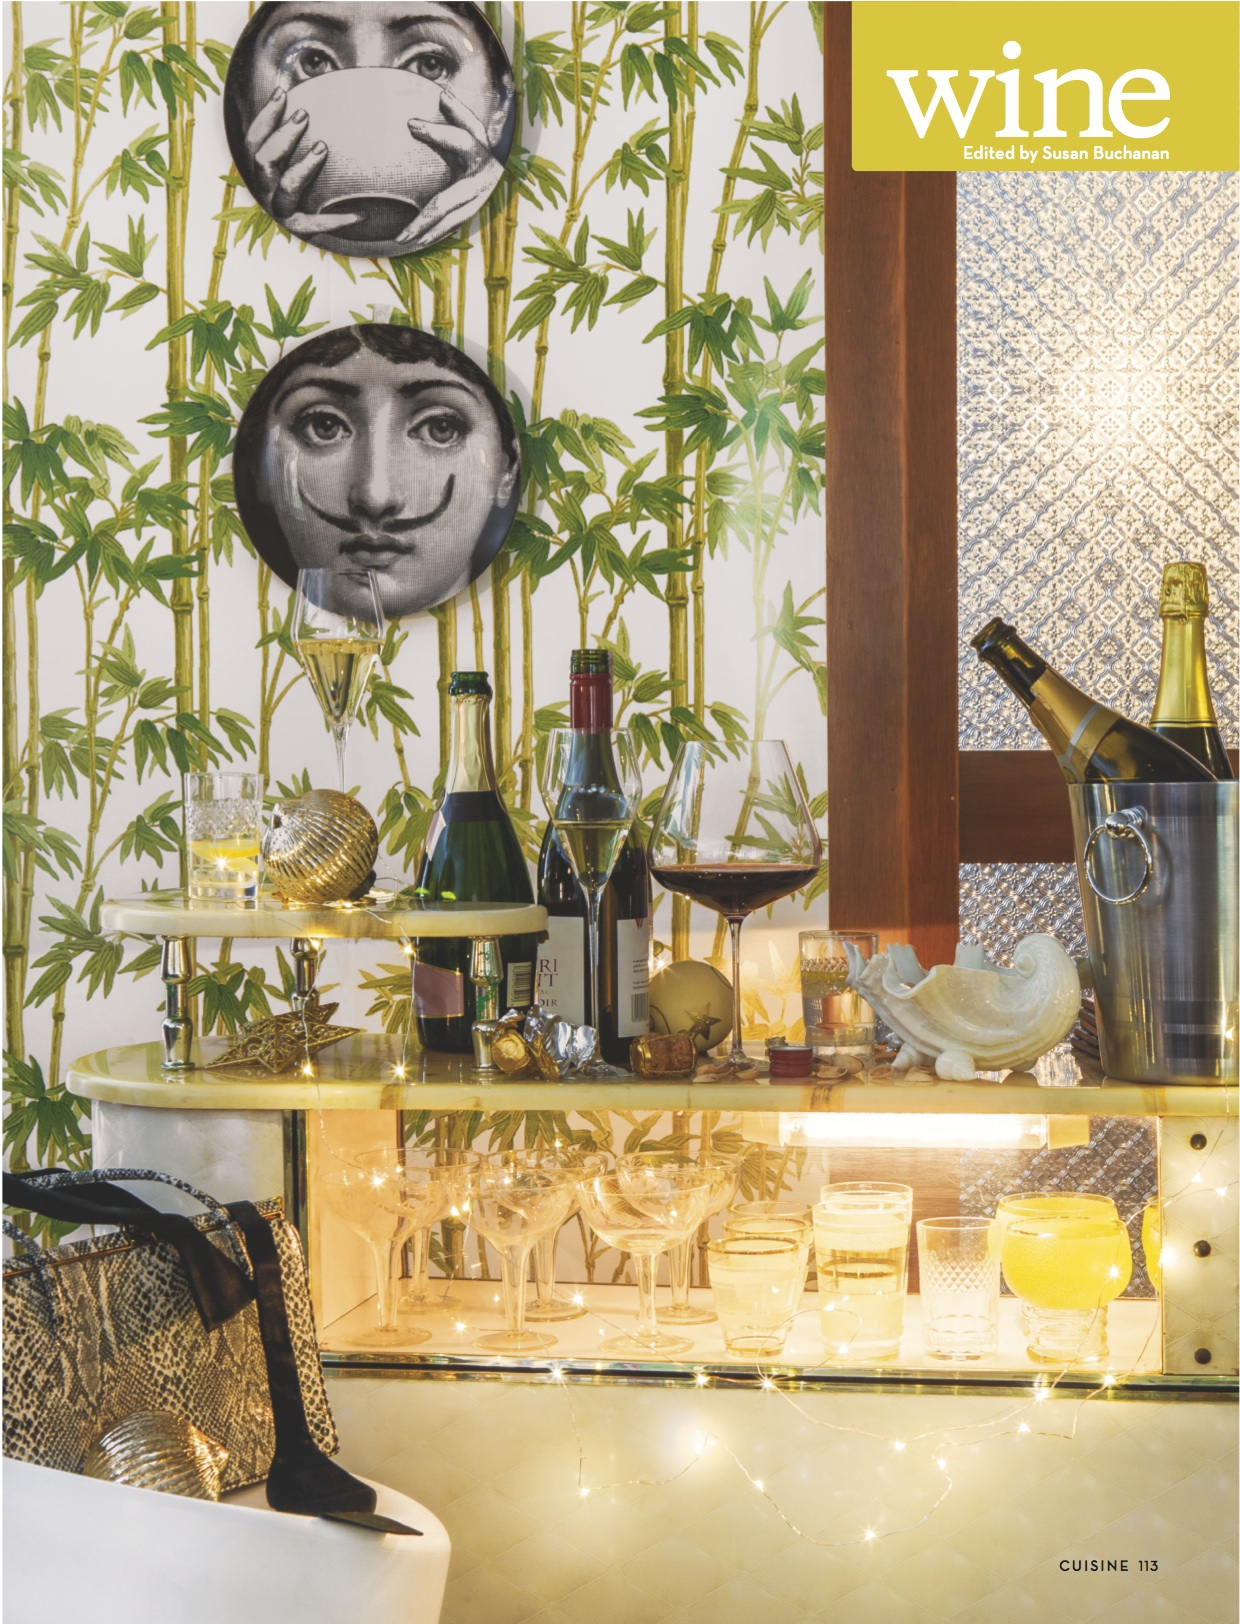 Zalto Denk'Art Crystal Glass Cuisine Magazine Fairfax Media Foxes Island Wines Cellar Door